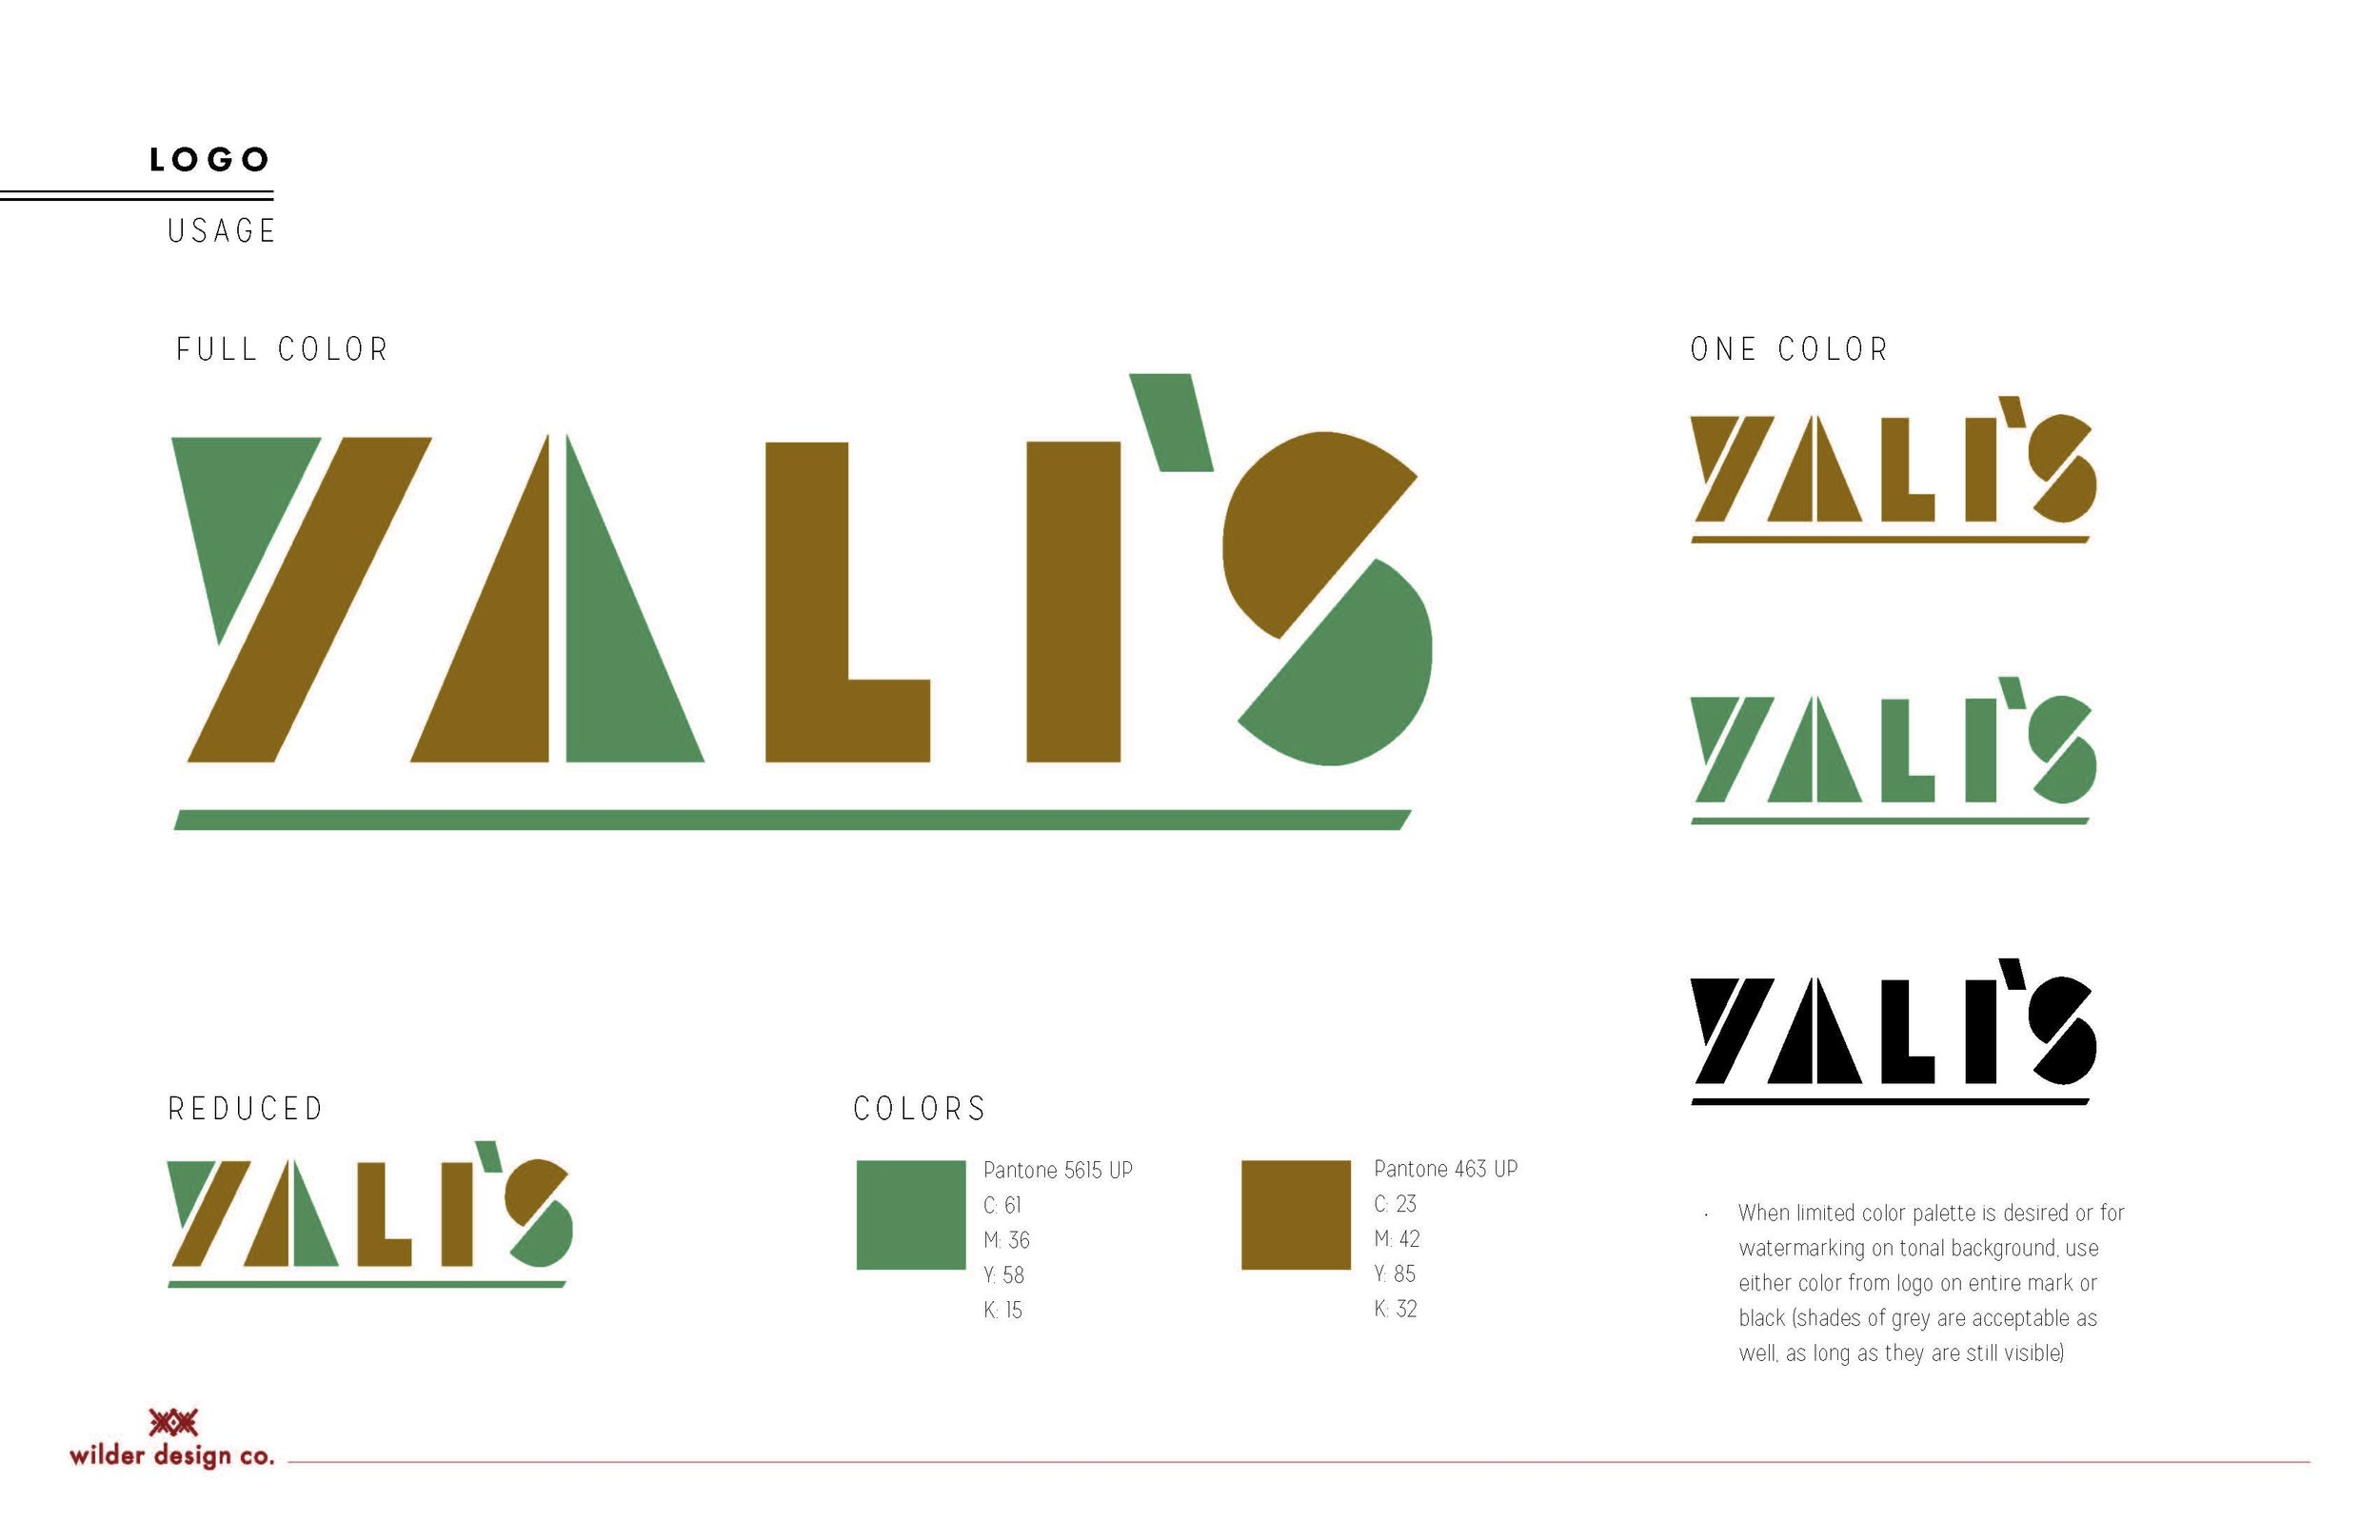 Yalis_Branding_Rd6_121517_v2_Page_06.jpg